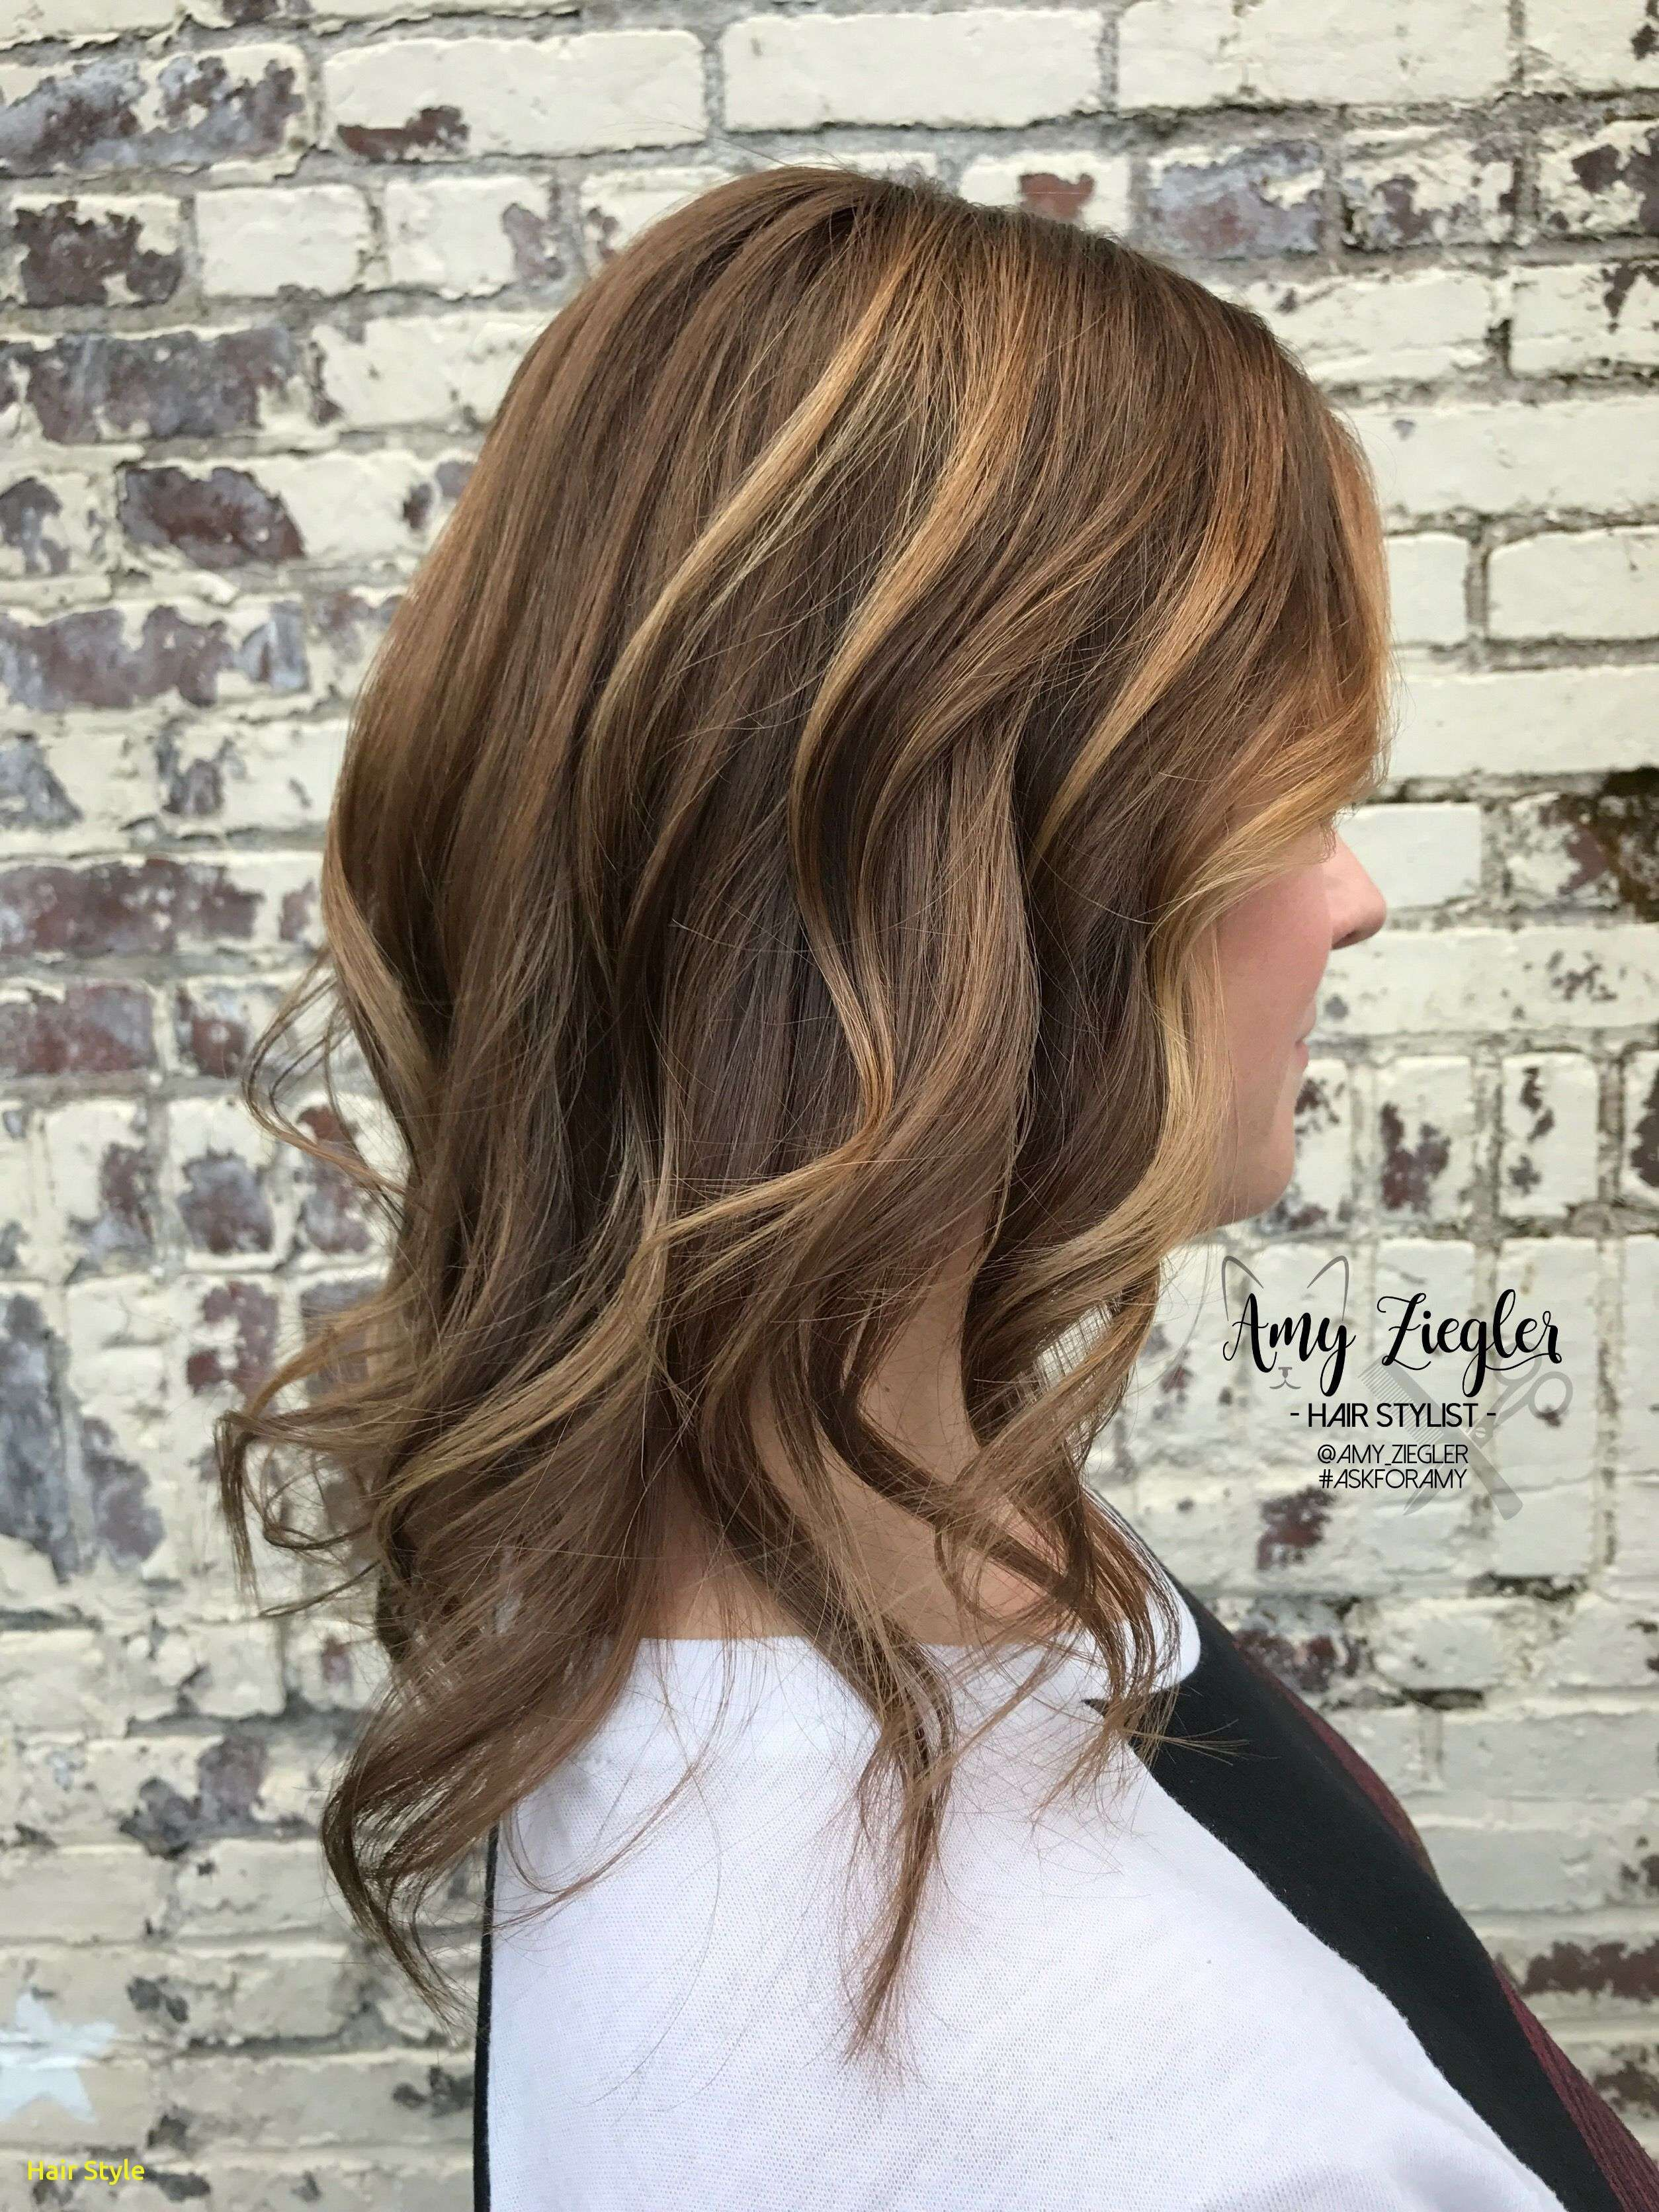 Frische Stufen Der Haarfarbe Haare Trends 2019 Pinterest